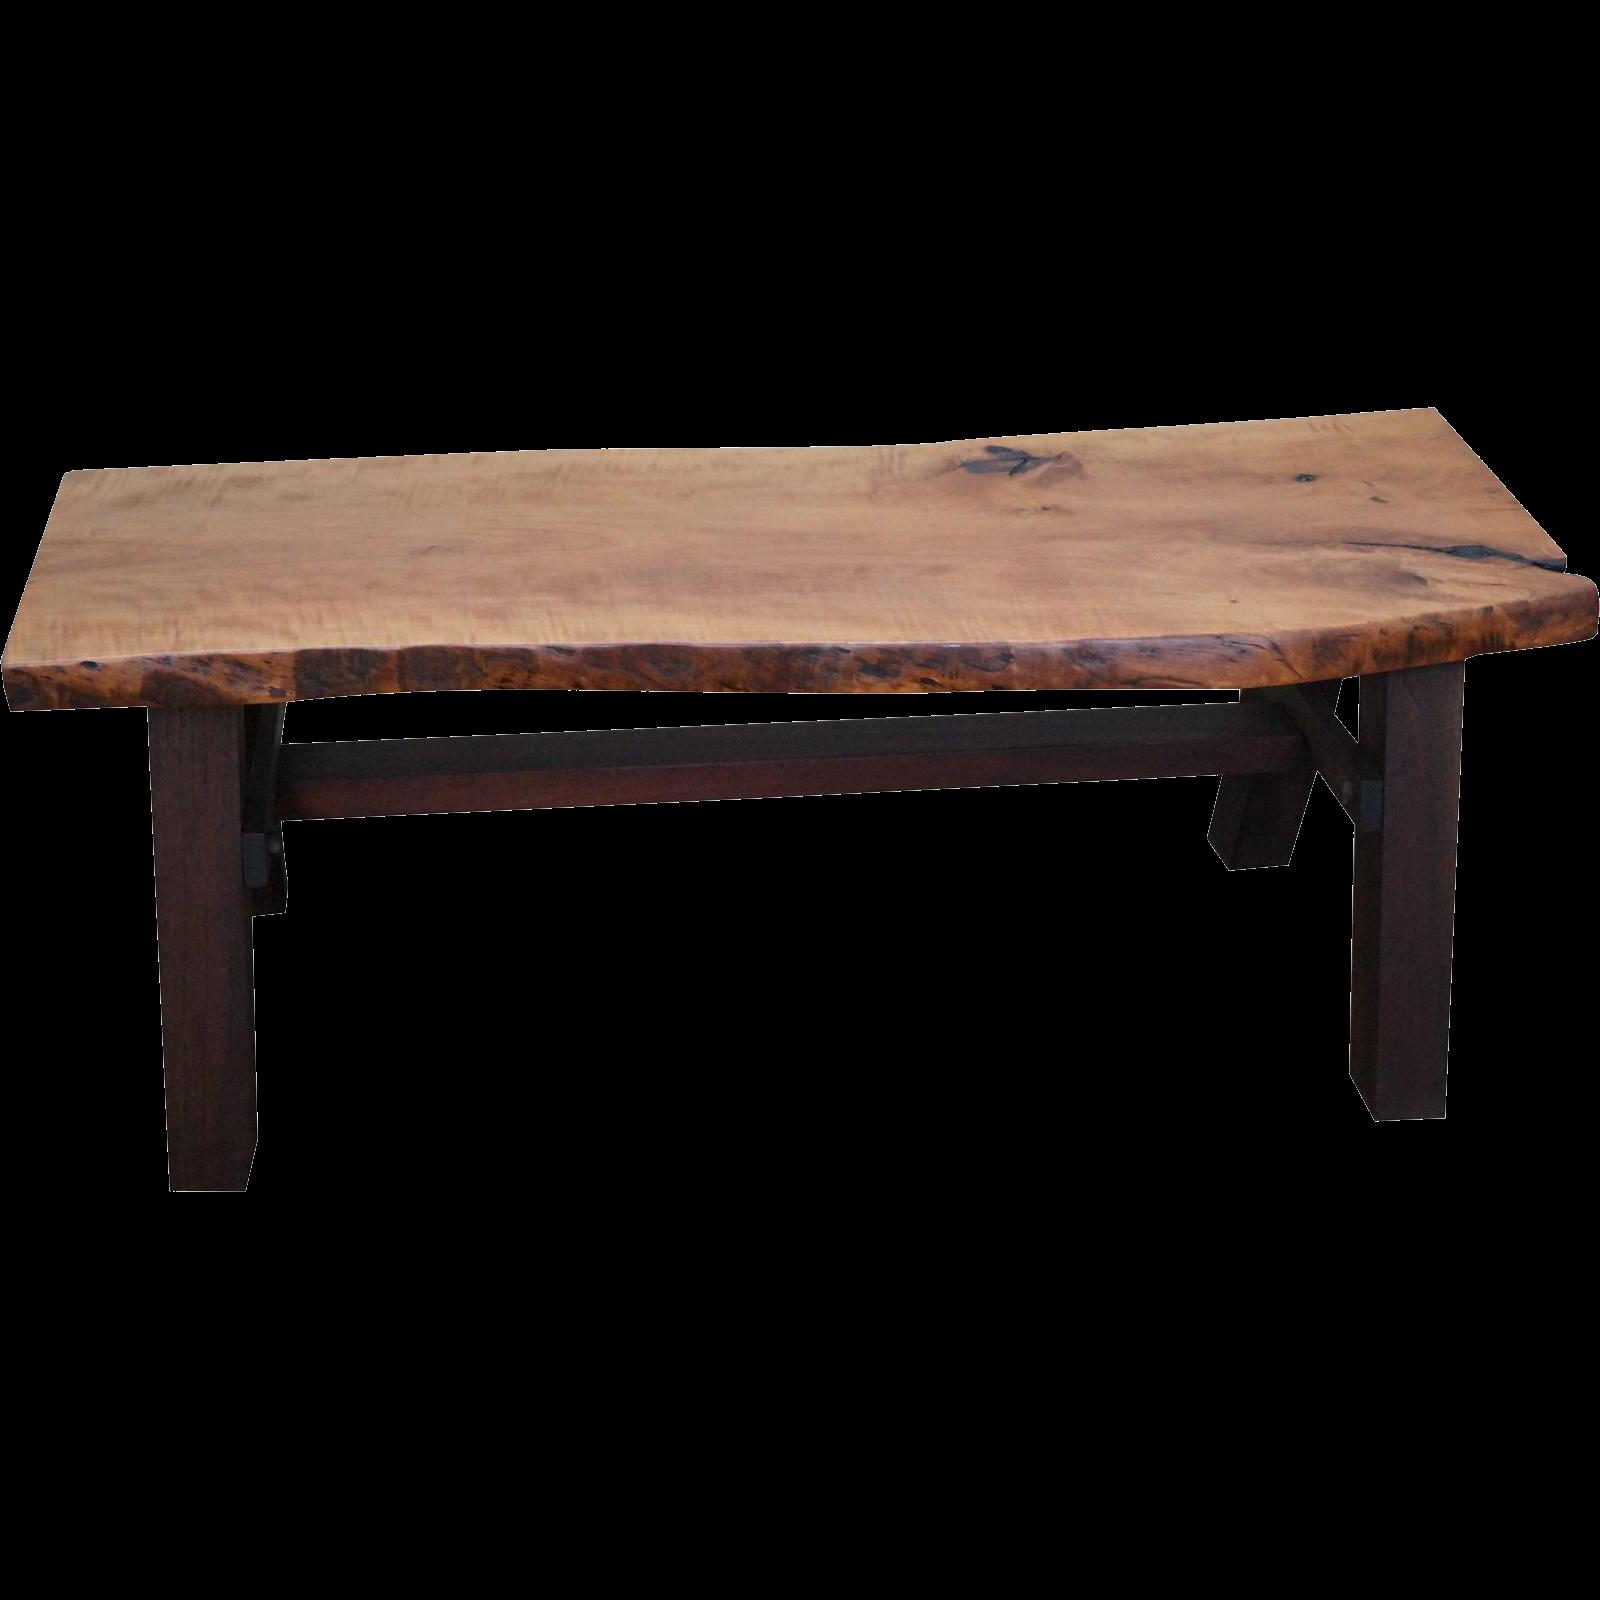 Bucks county studio made free form slab wood coffee table for Free form wood coffee tables